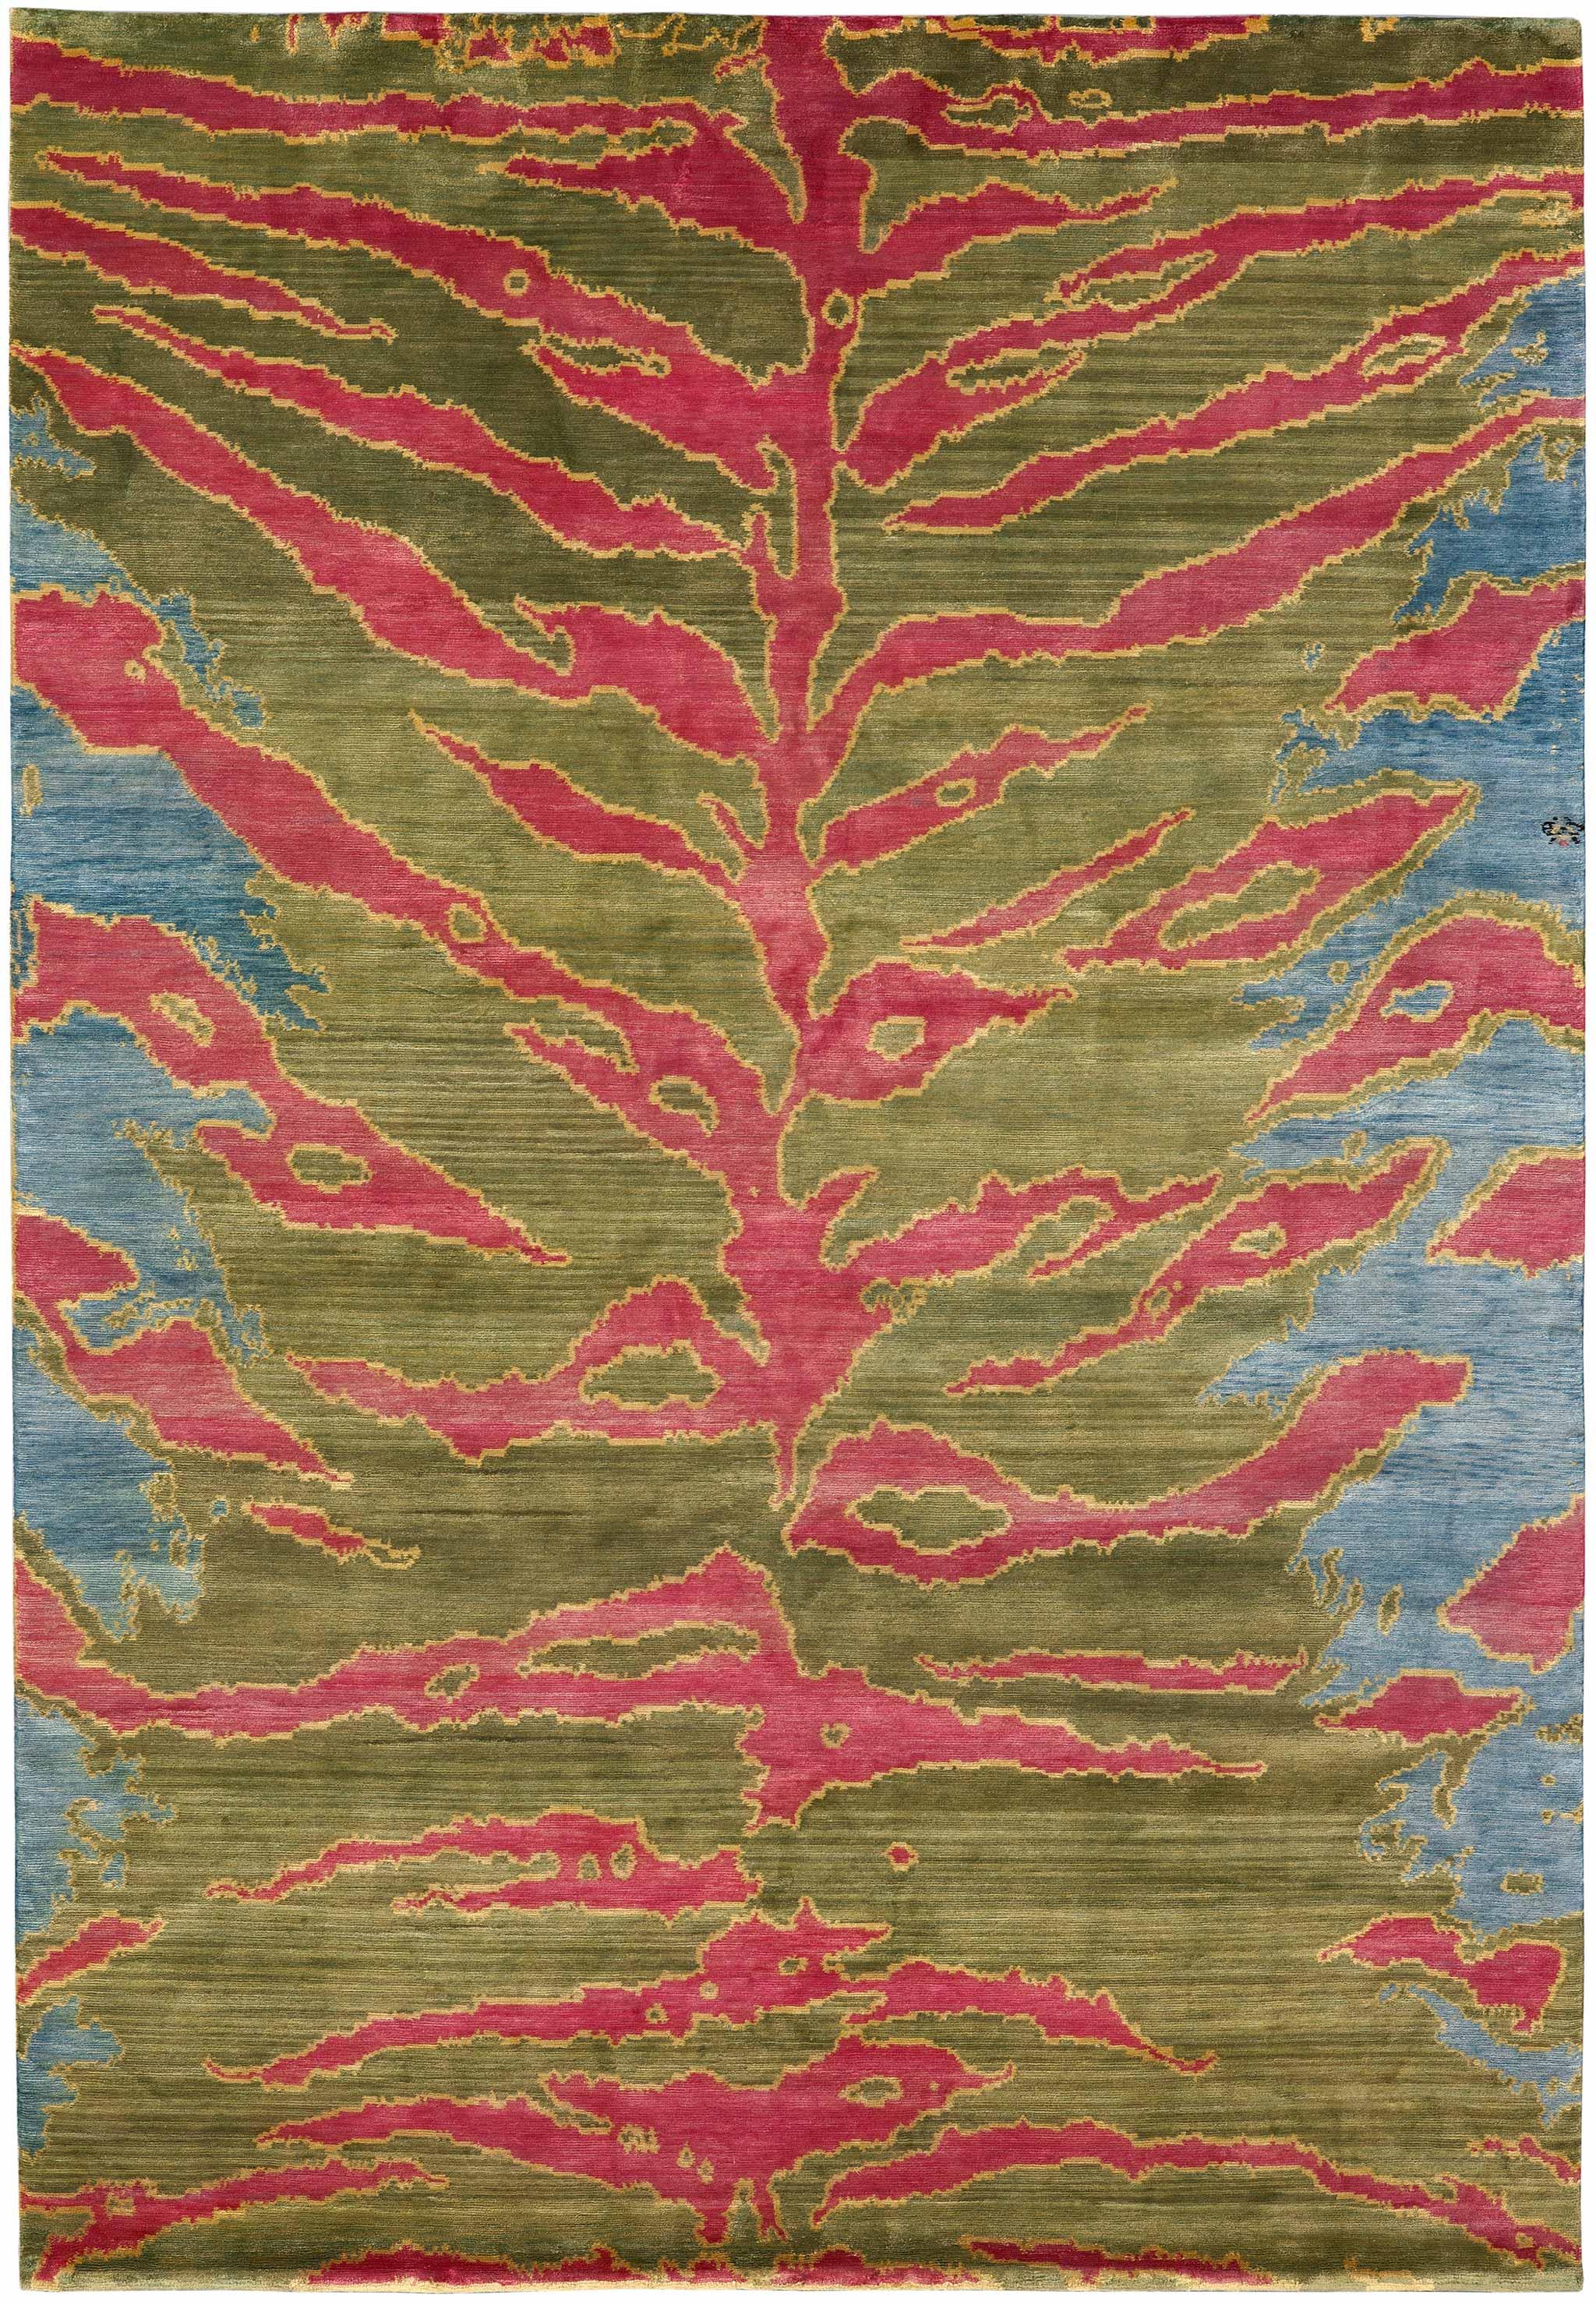 Tiger shown in colour Green by Joseph Carini Carpets - 100% silk handknotted in Nepal.   Image courtesy of Joseph Carini Carpets.